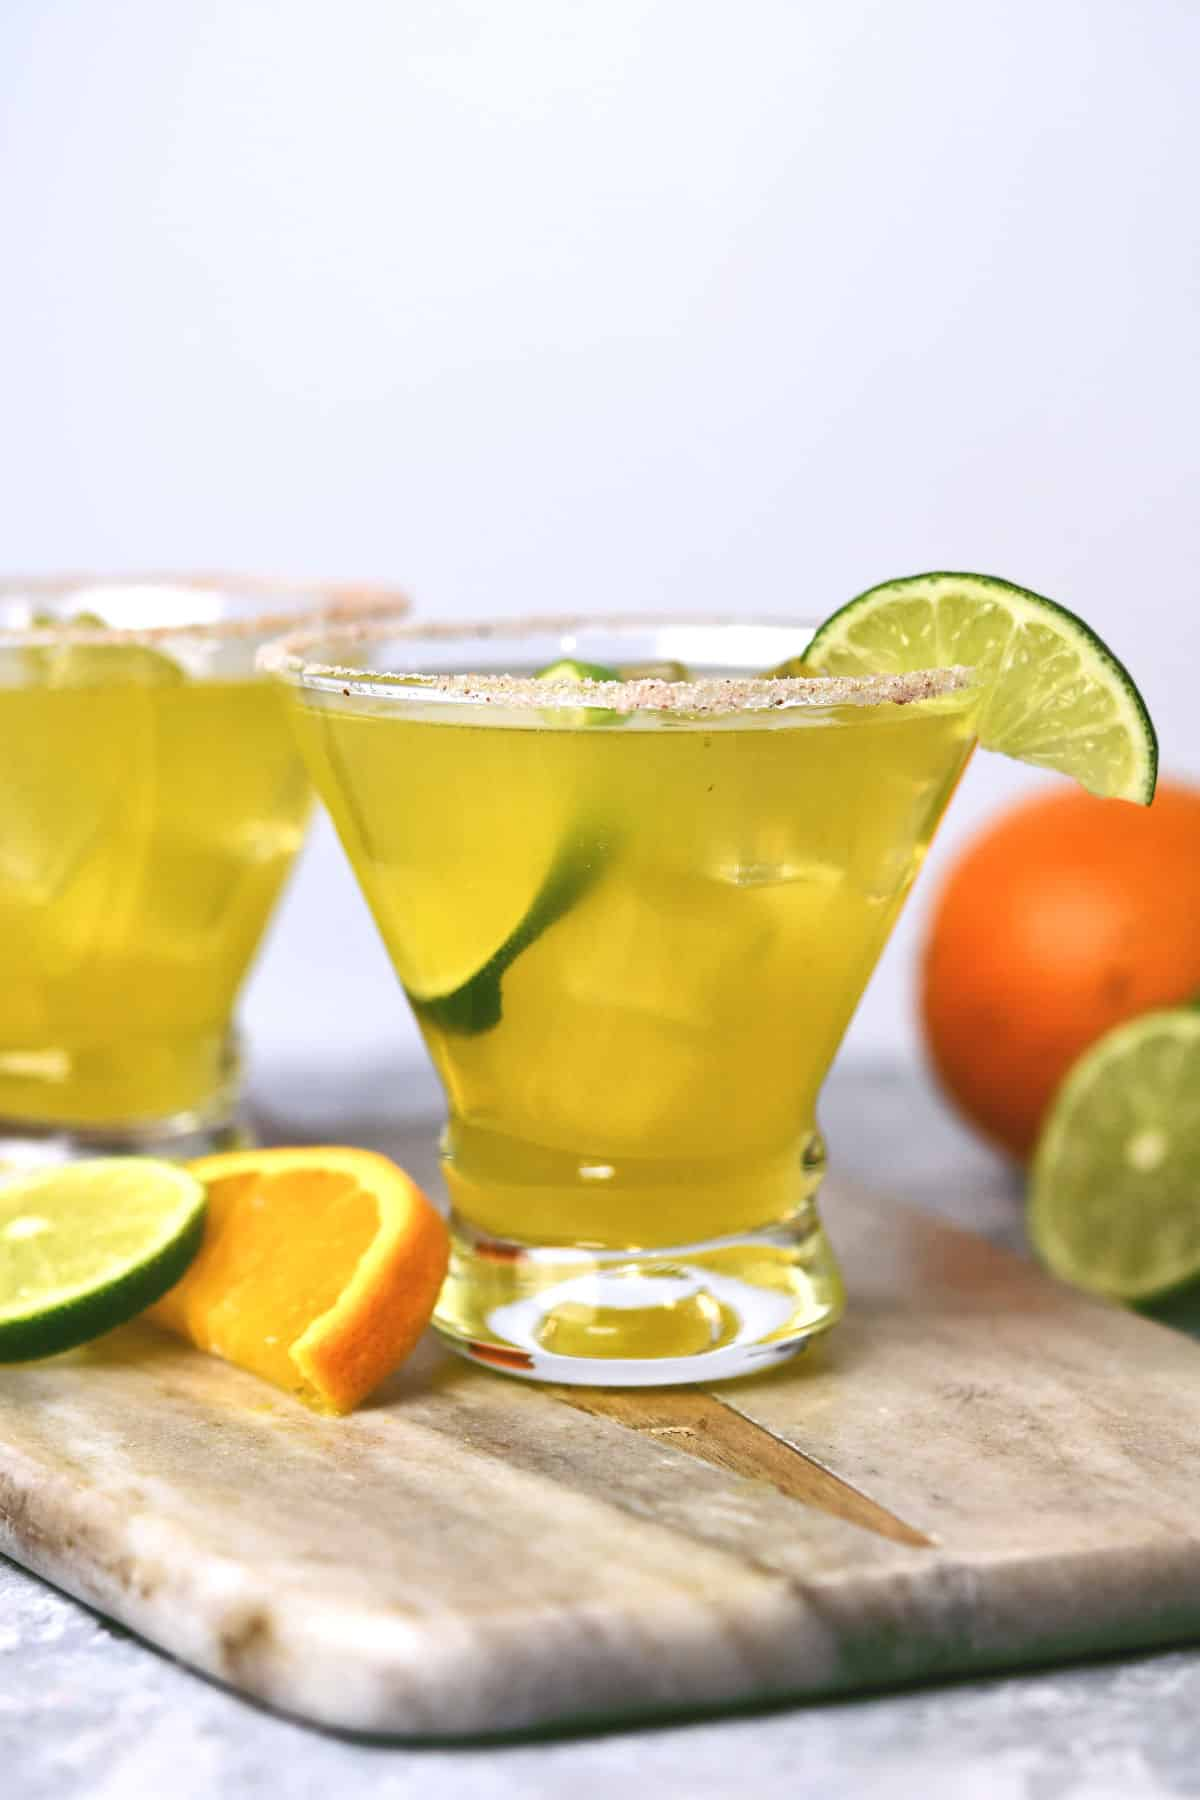 24Bite: Margarita Mocktail Recipe No Alcohol by Christian Guzman